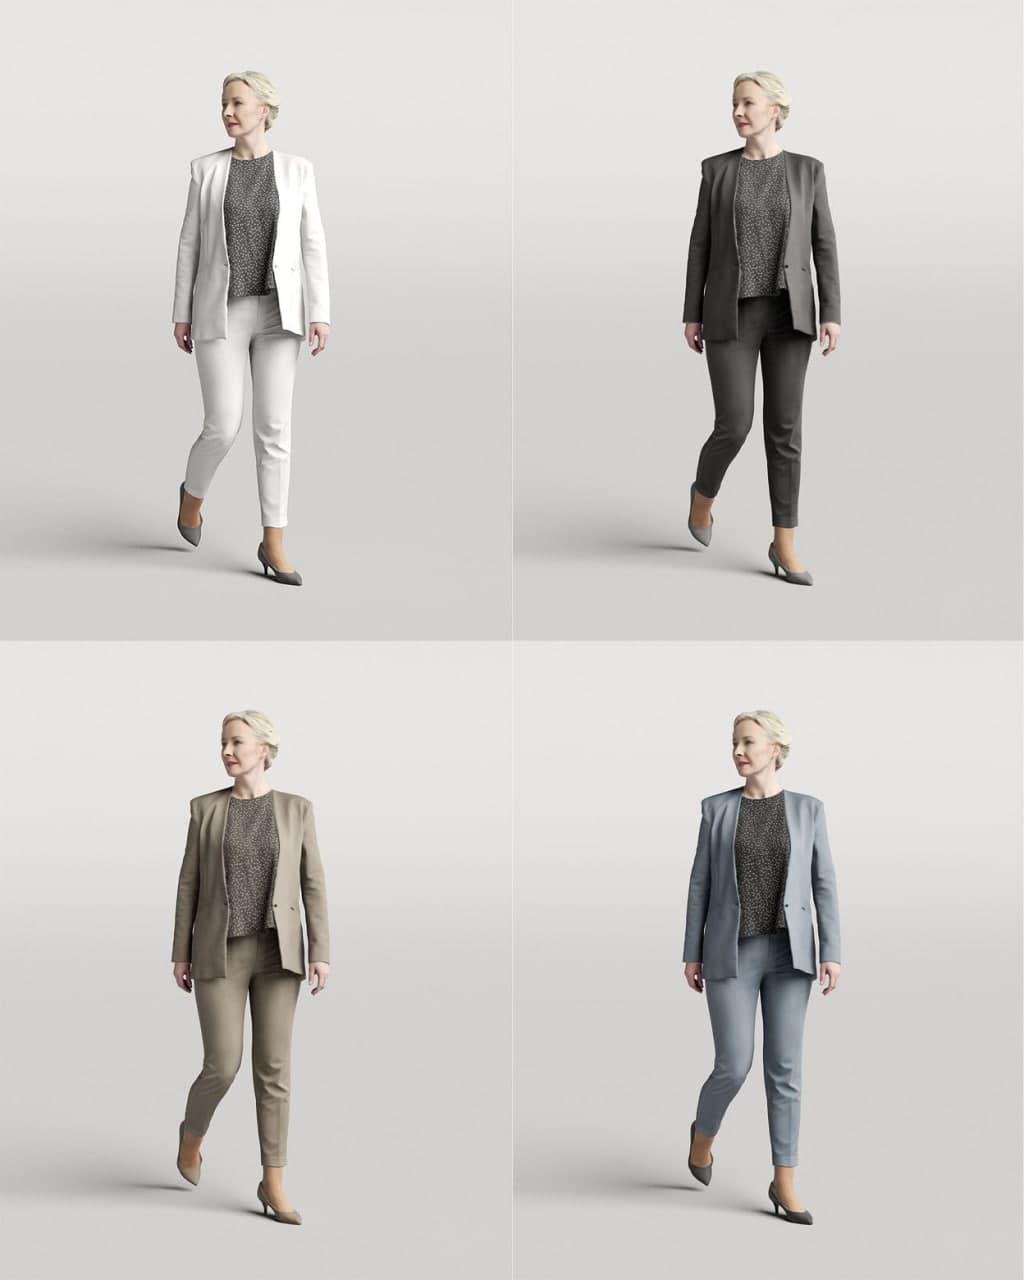 Humano Elegant woman walking and looking back 0306 3D model